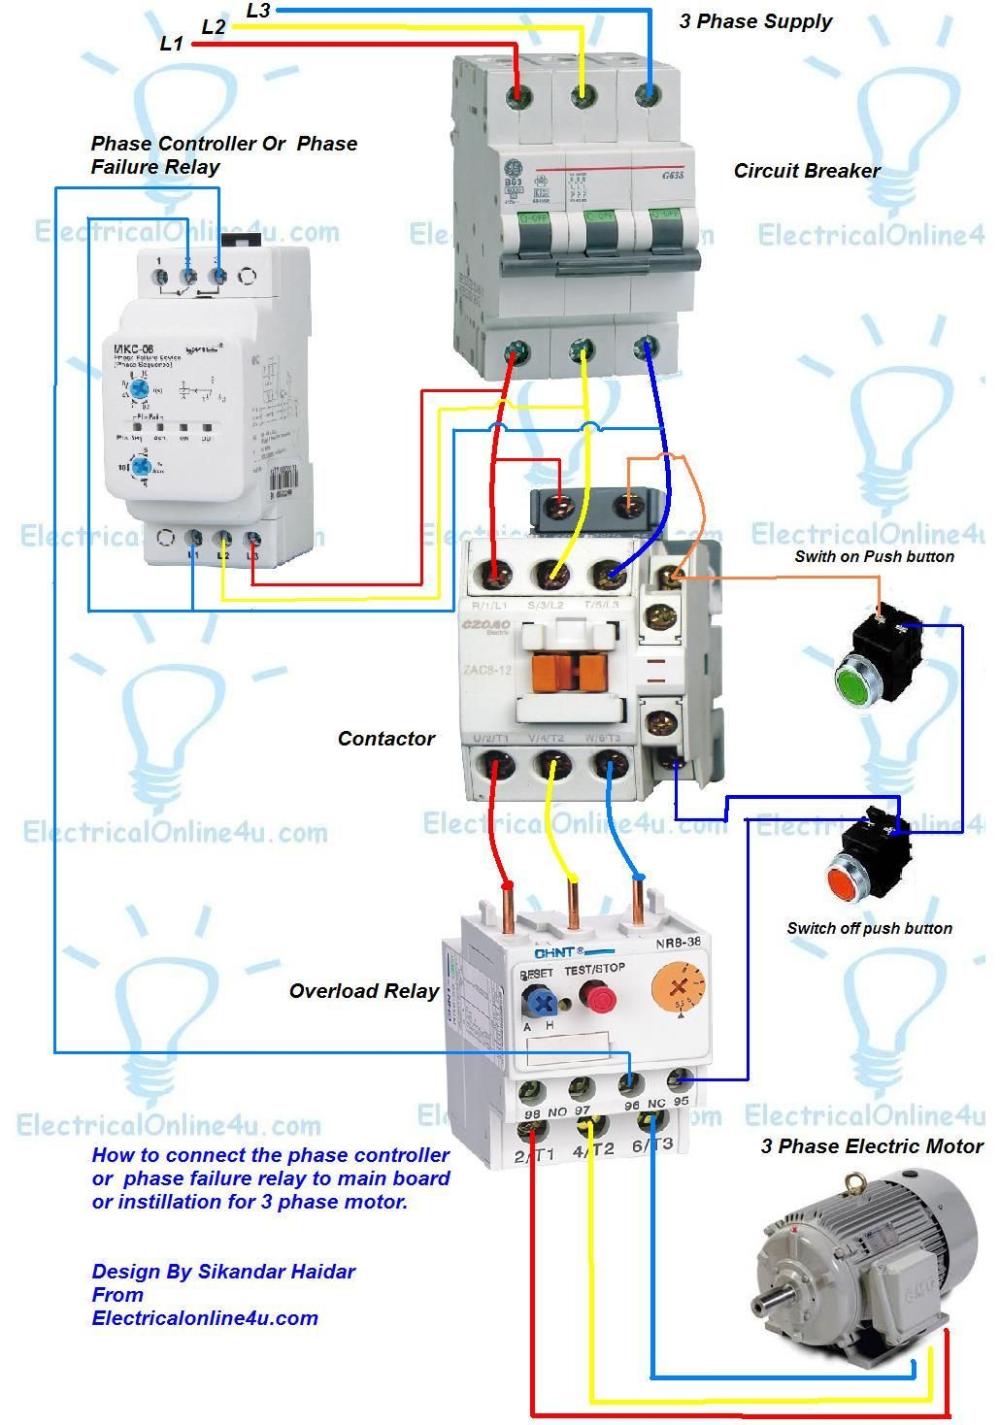 3 Phase Contactor Wiring Diagram Start Stop Pdf 2 pole contactor wiring d…  en 2020 | Instalacion electrica industrial, Plano instalacion electrica,  Imagenes de electricidadPinterest